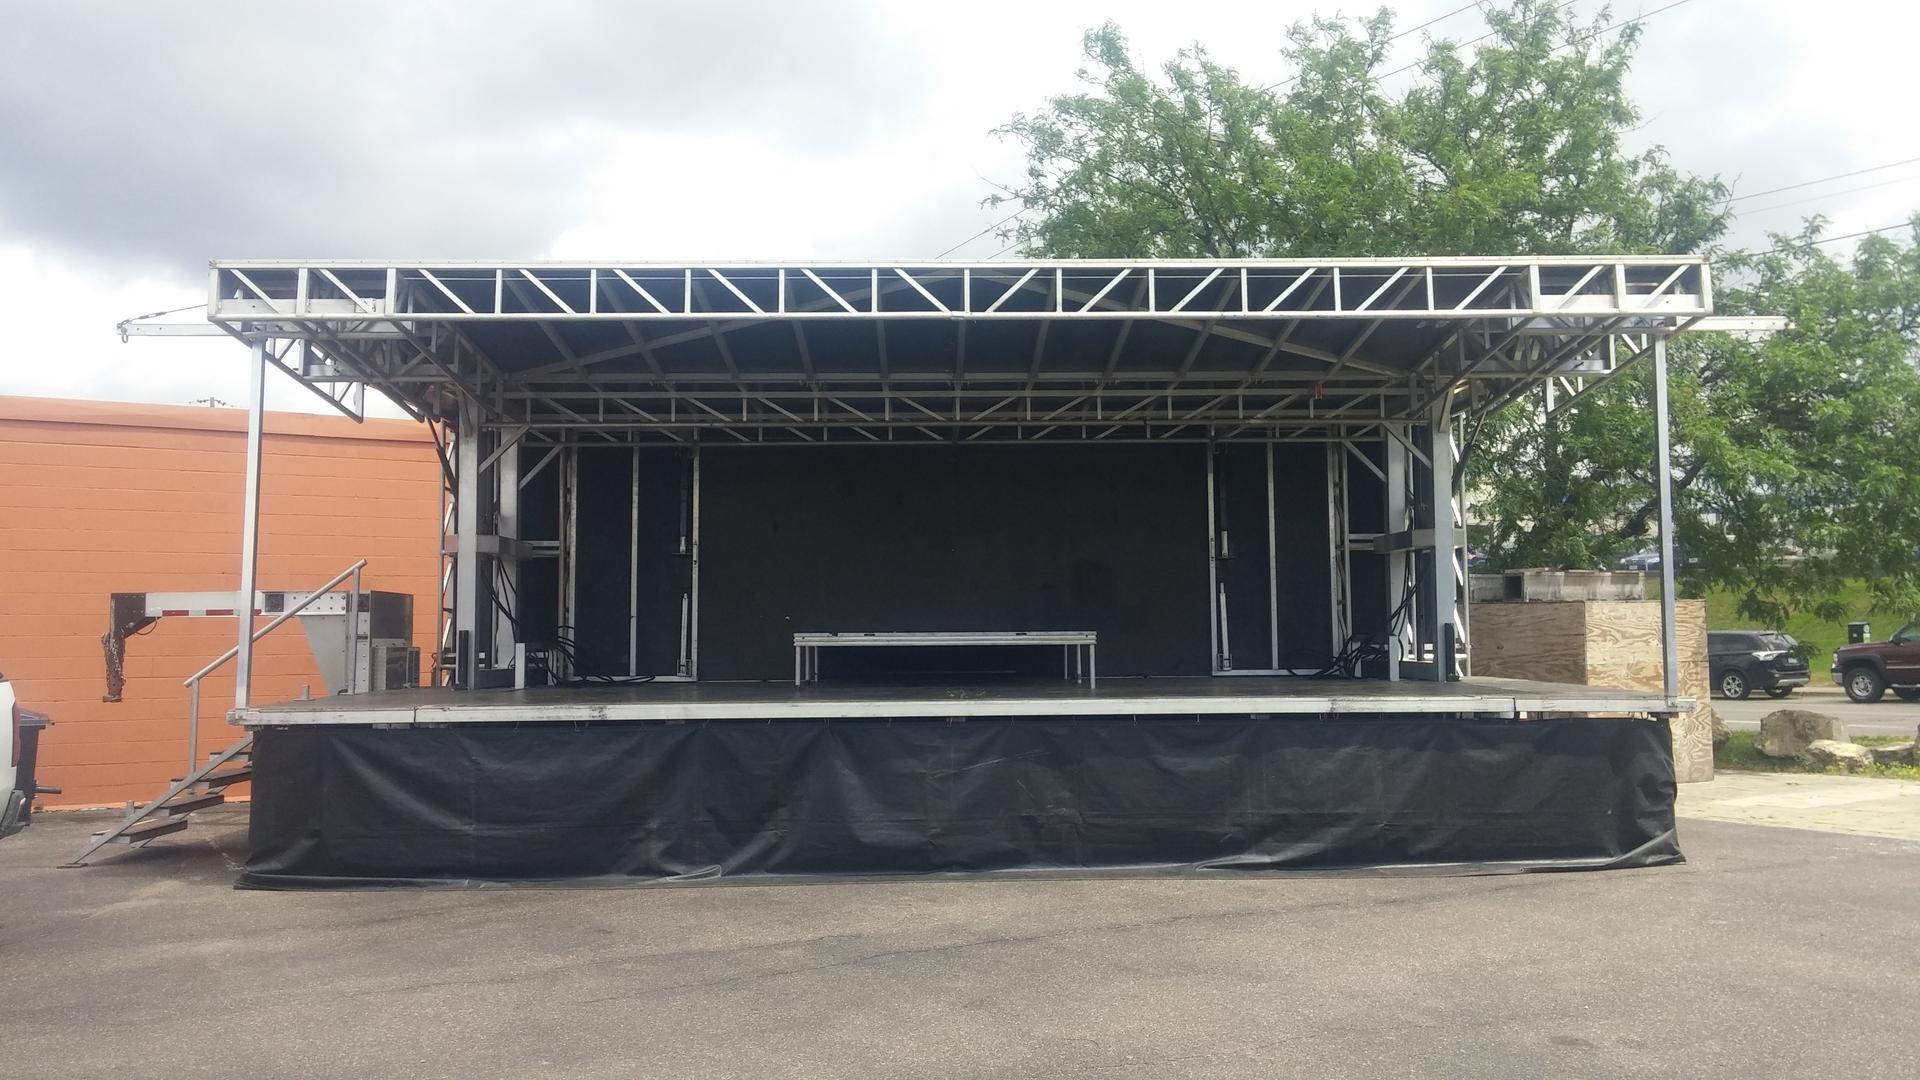 Festival Mobile Stage Rentals - Apex Mobile Stage Rentals